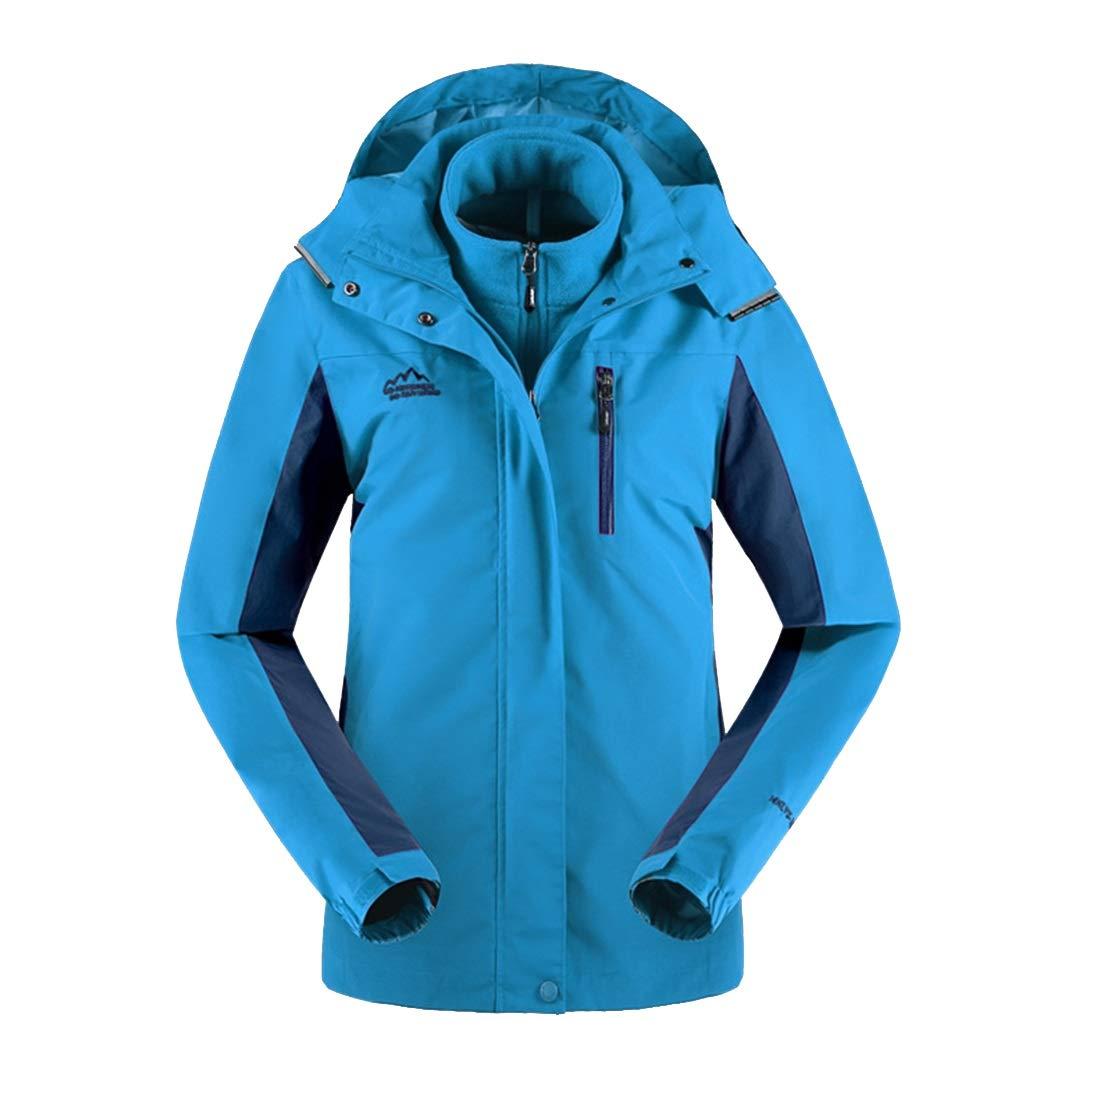 bluee AUSWIEI Winter Autumn Jacket Women's Threeinone TwoPiece Suit Breathable Plus Velvet Padded Jacket Jacket (color   bluee, Size   XXL)